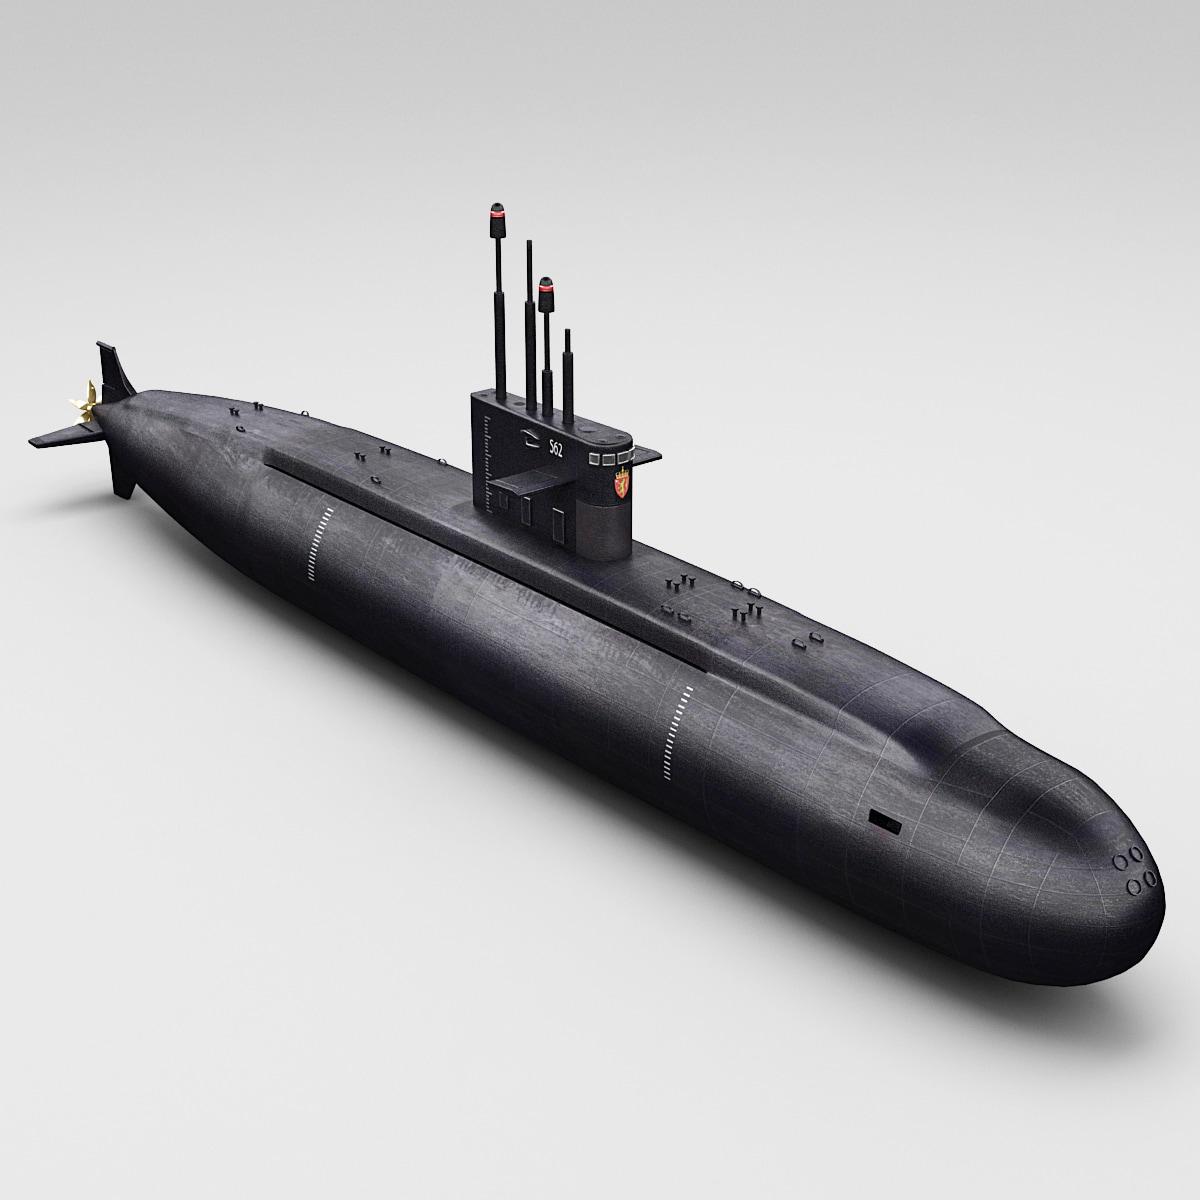 Russian_Lada_Class_Submarine_0000.jpg